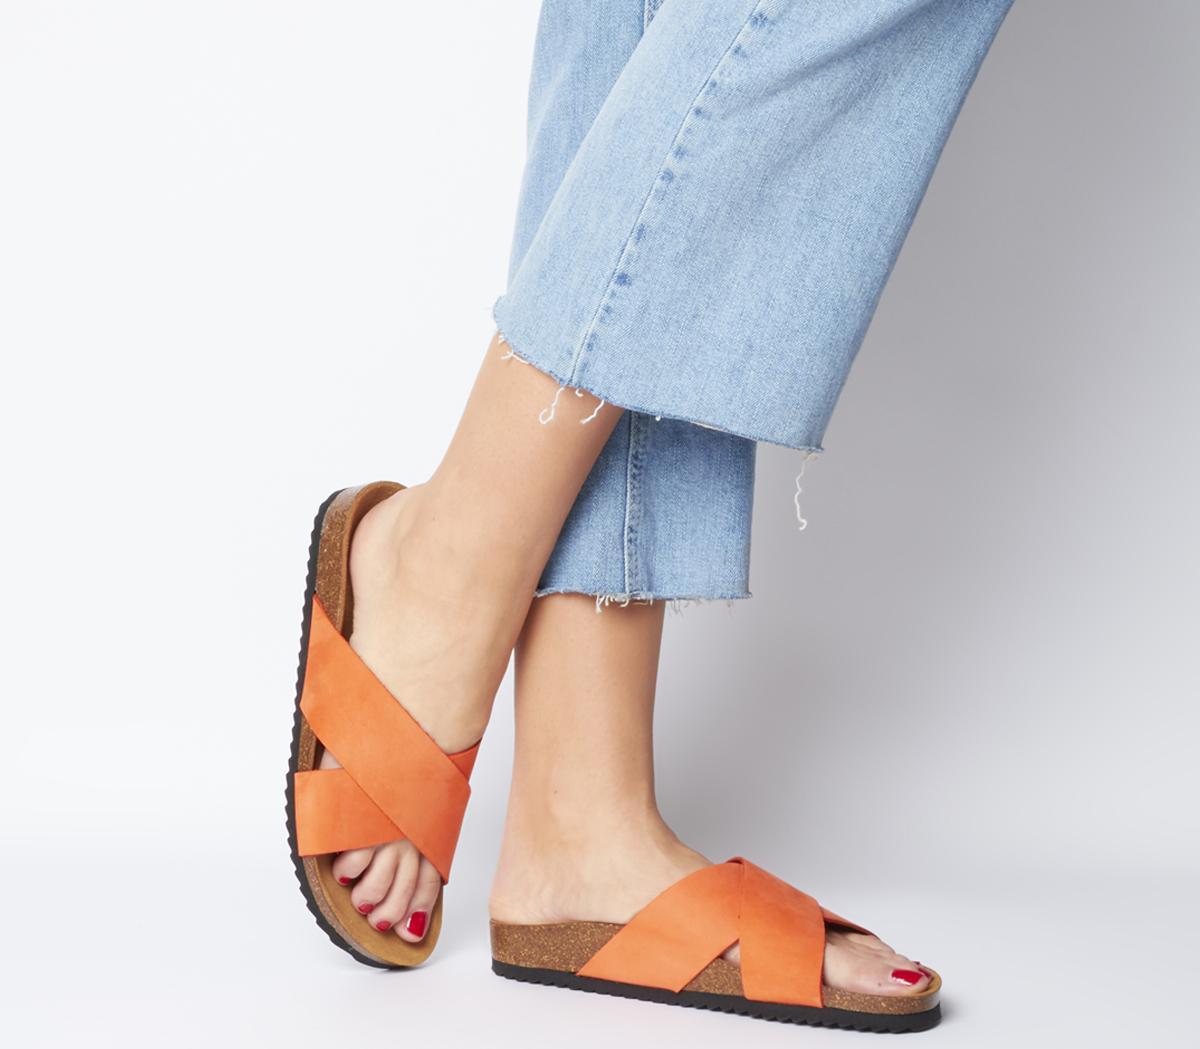 Hoxton 2 Sandals